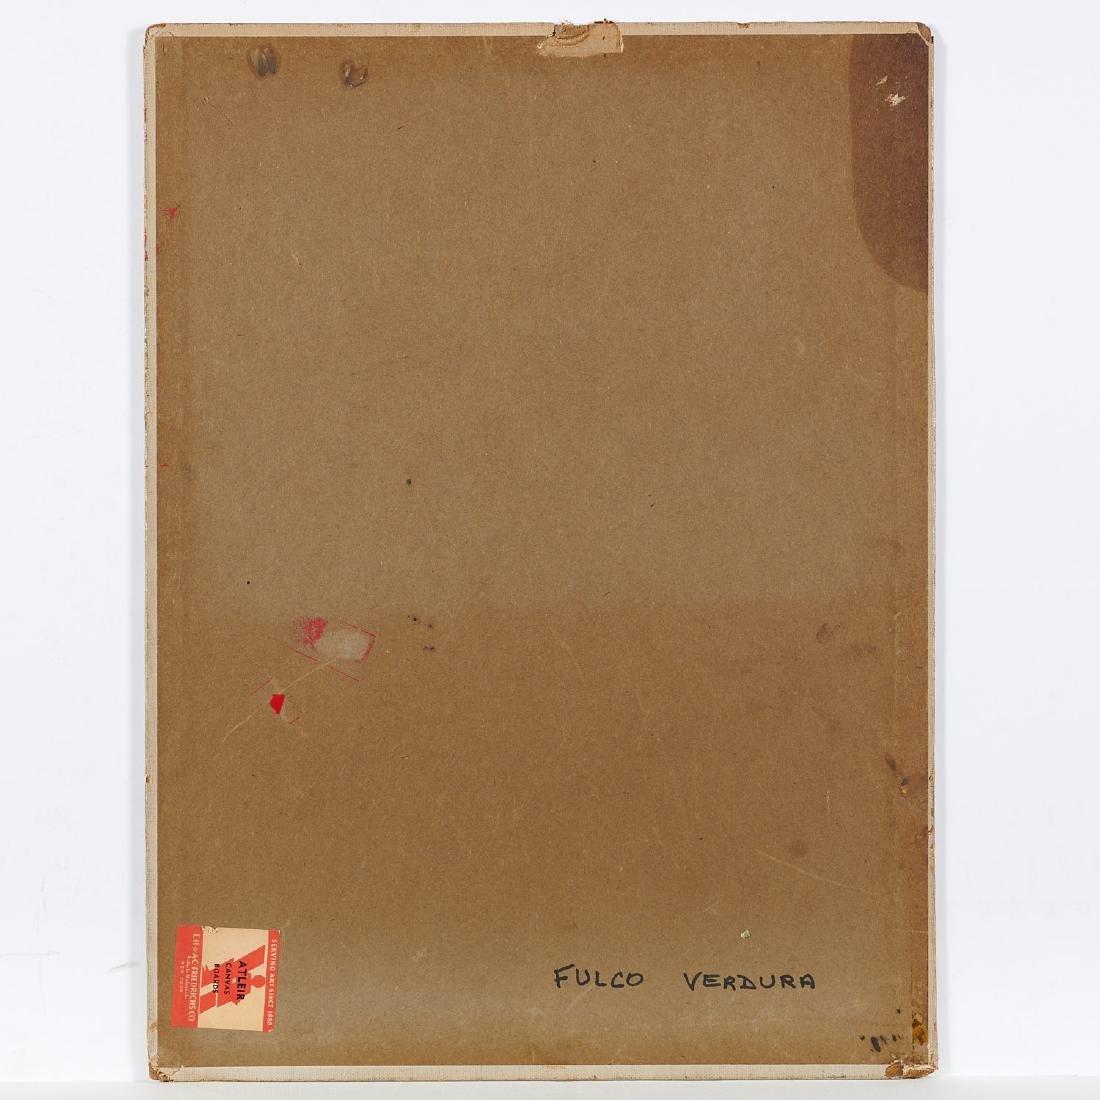 Fulco De Verdure, Still Life by Window, c. 1930s - 5